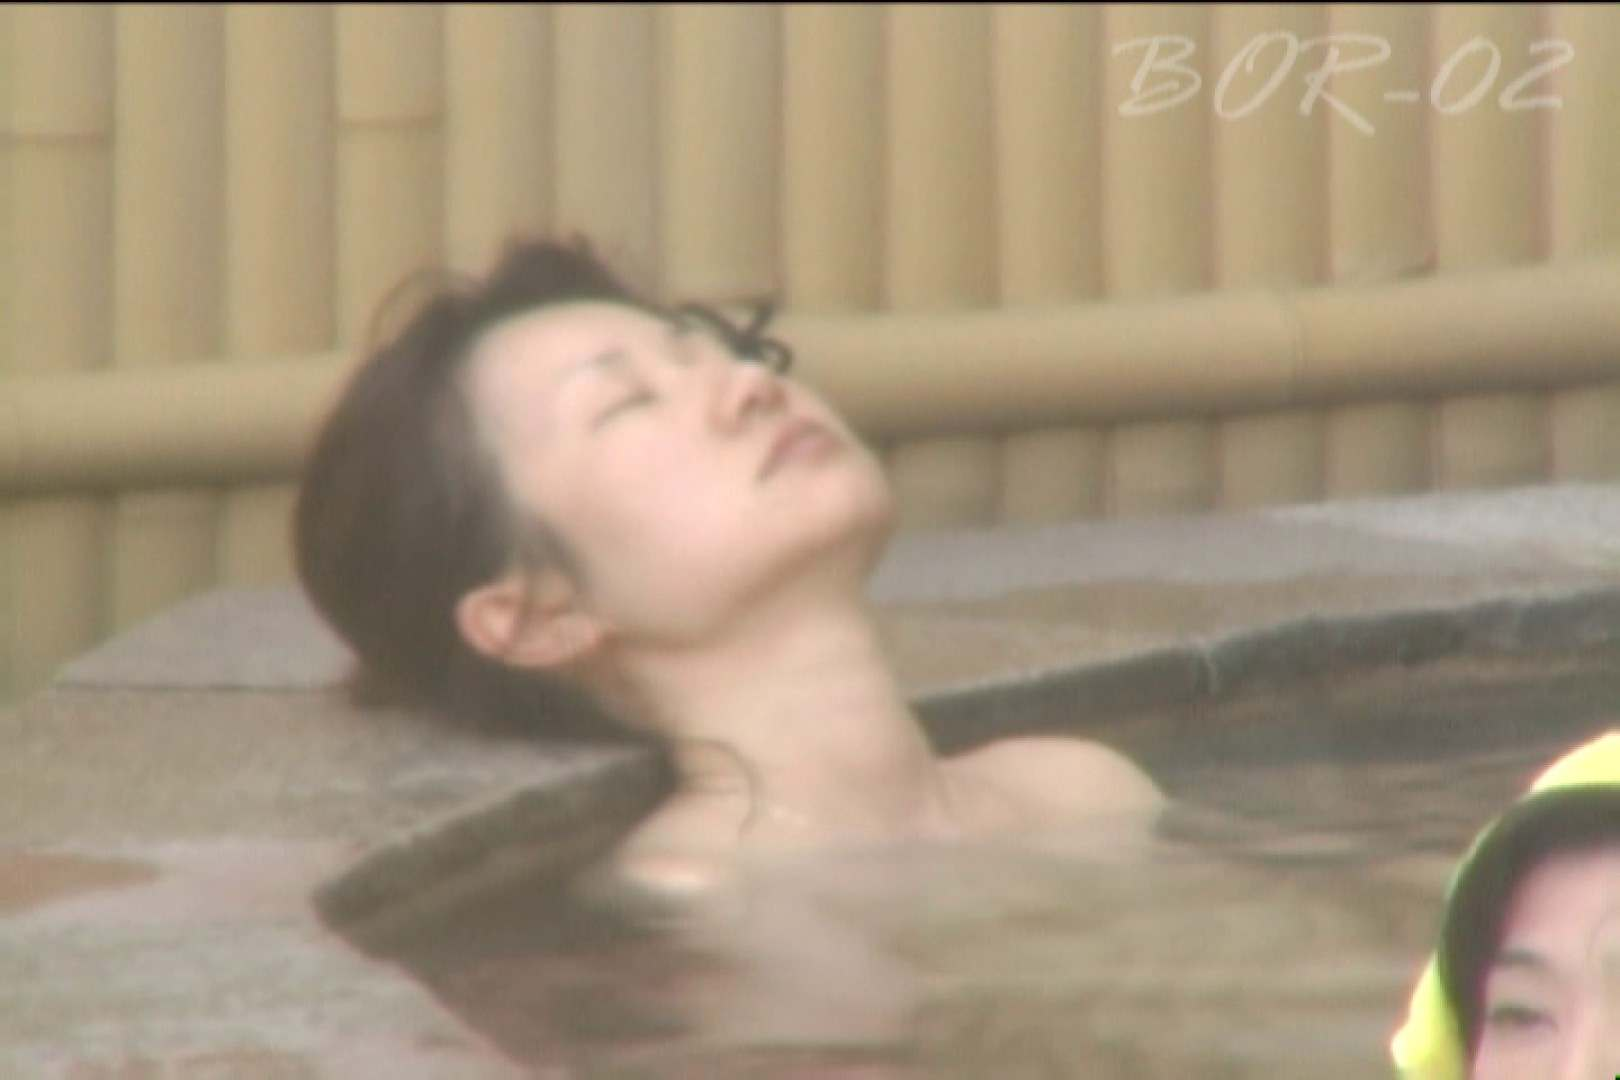 Aquaな露天風呂Vol.477 盗撮シリーズ | 露天風呂編  104PIX 27